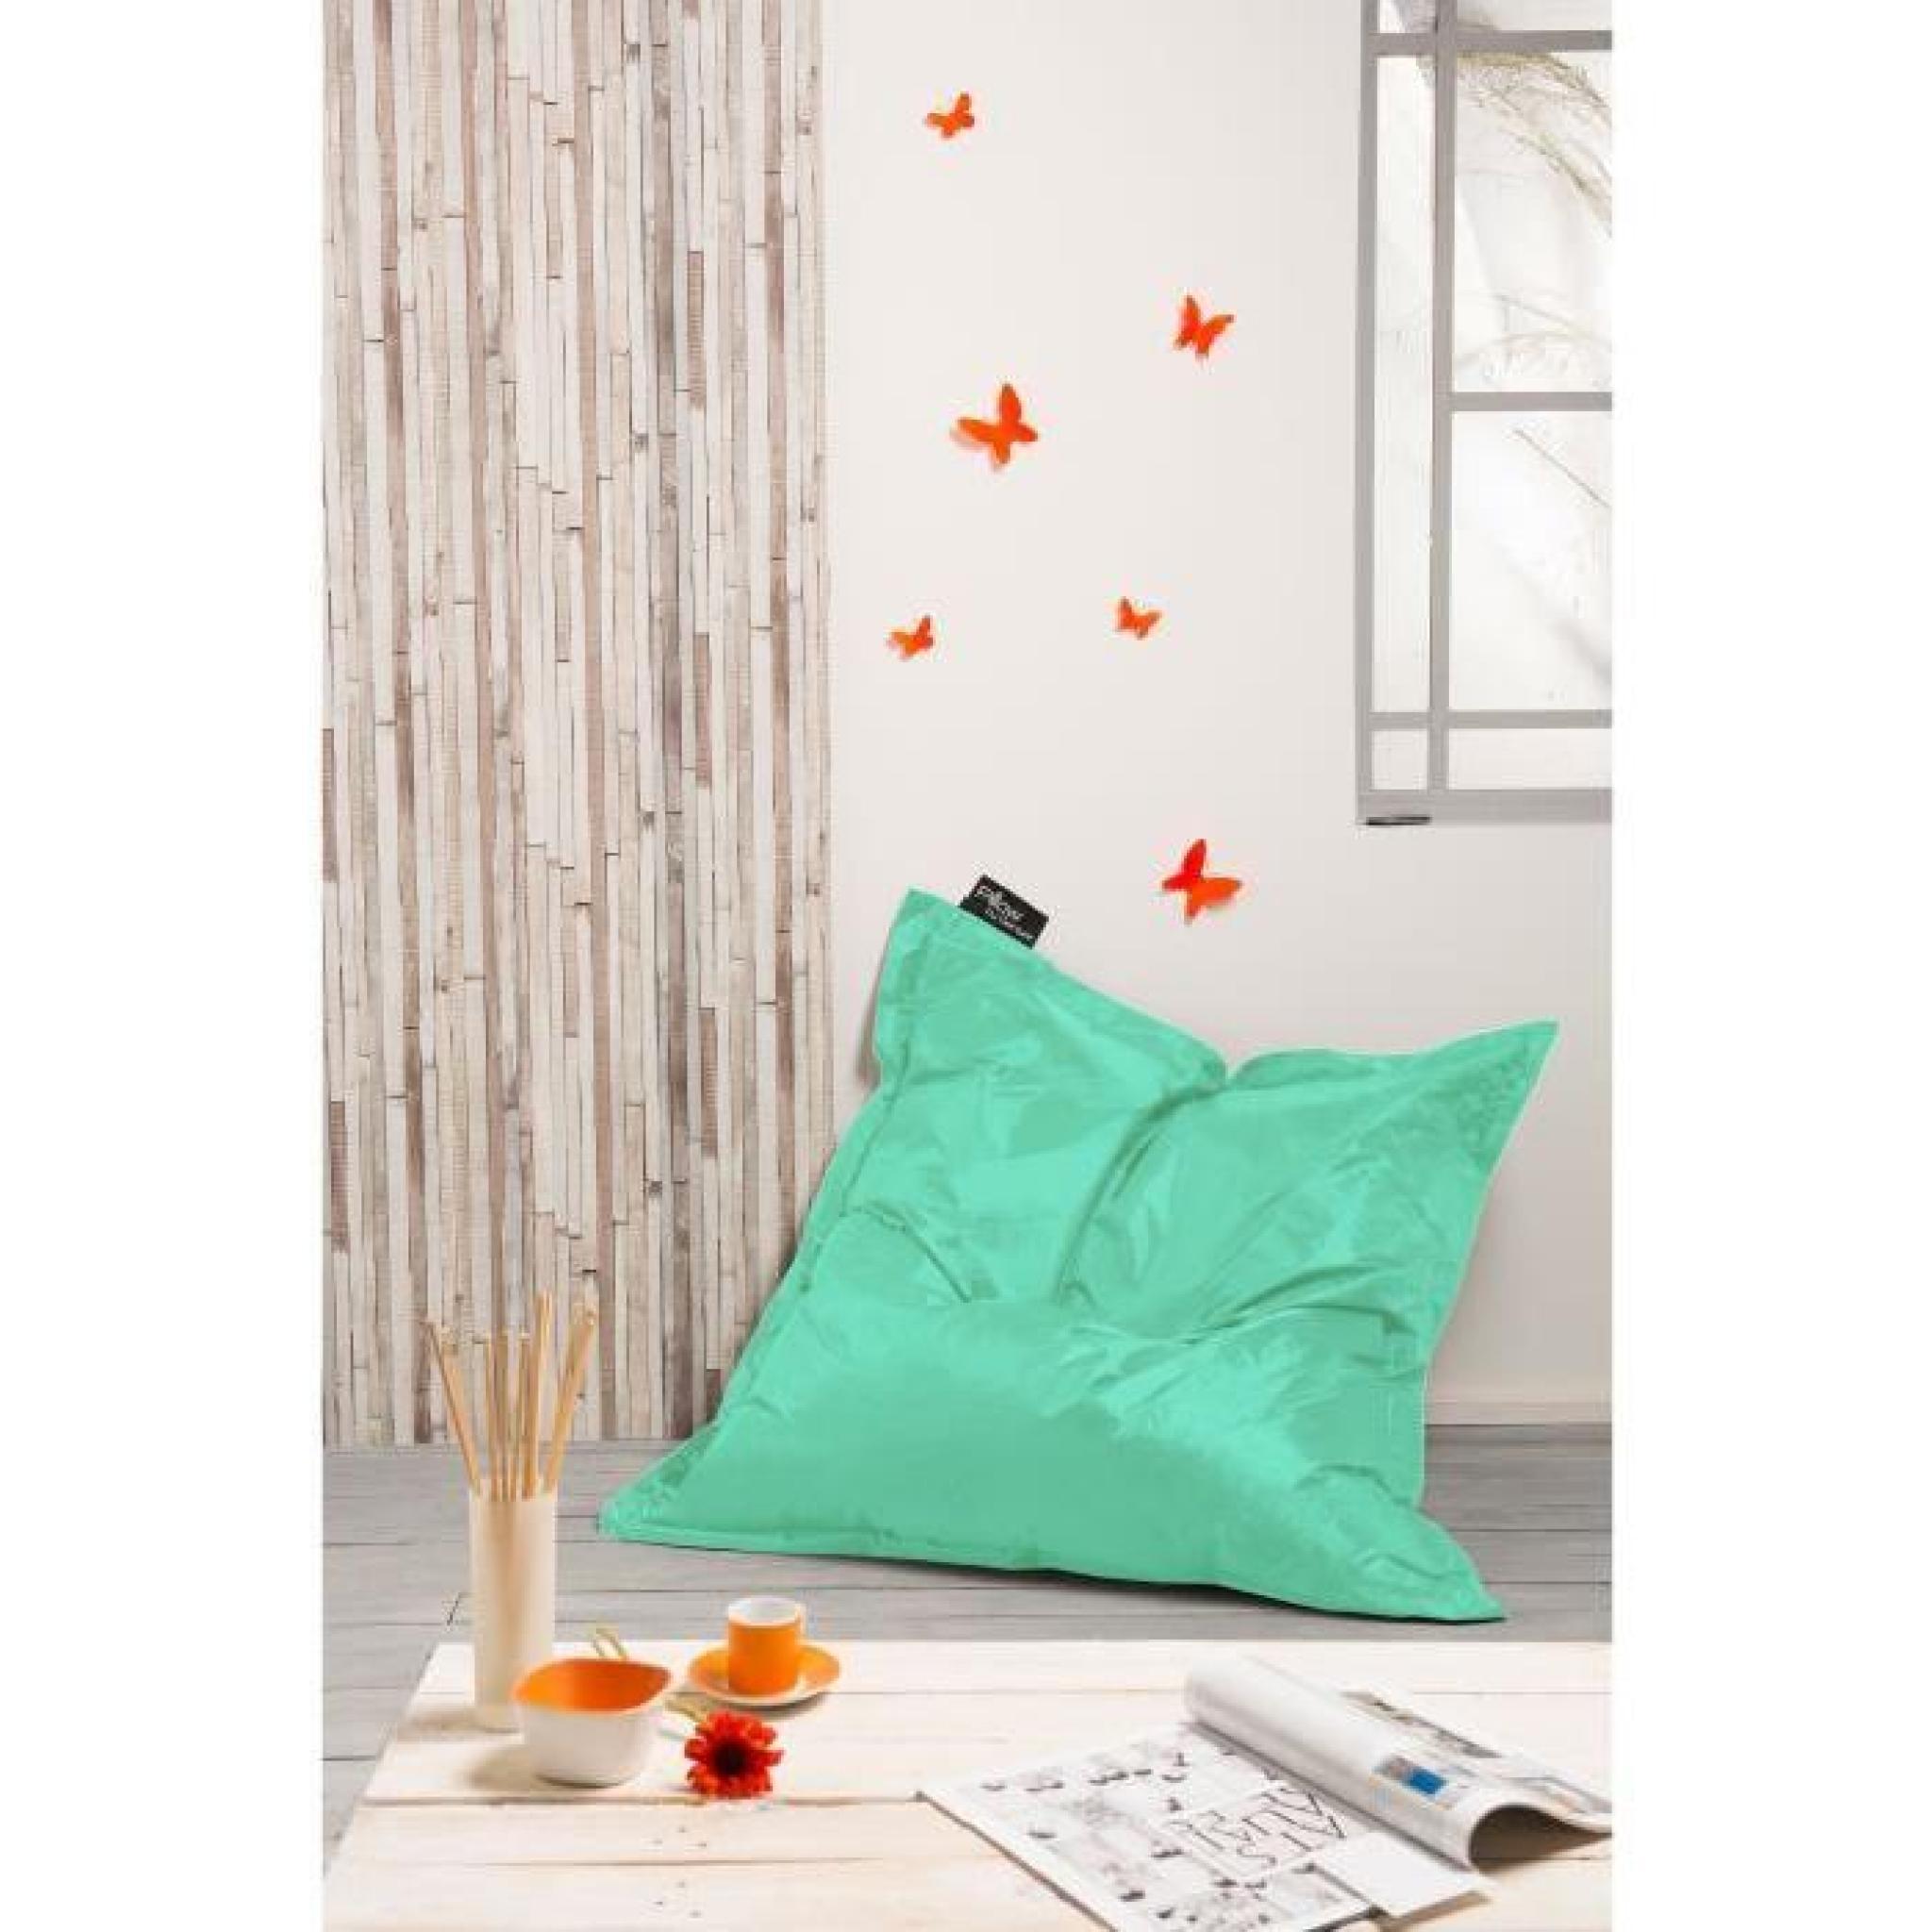 coussin pouf xxl imperm able turquoise 120x120 cm achat. Black Bedroom Furniture Sets. Home Design Ideas